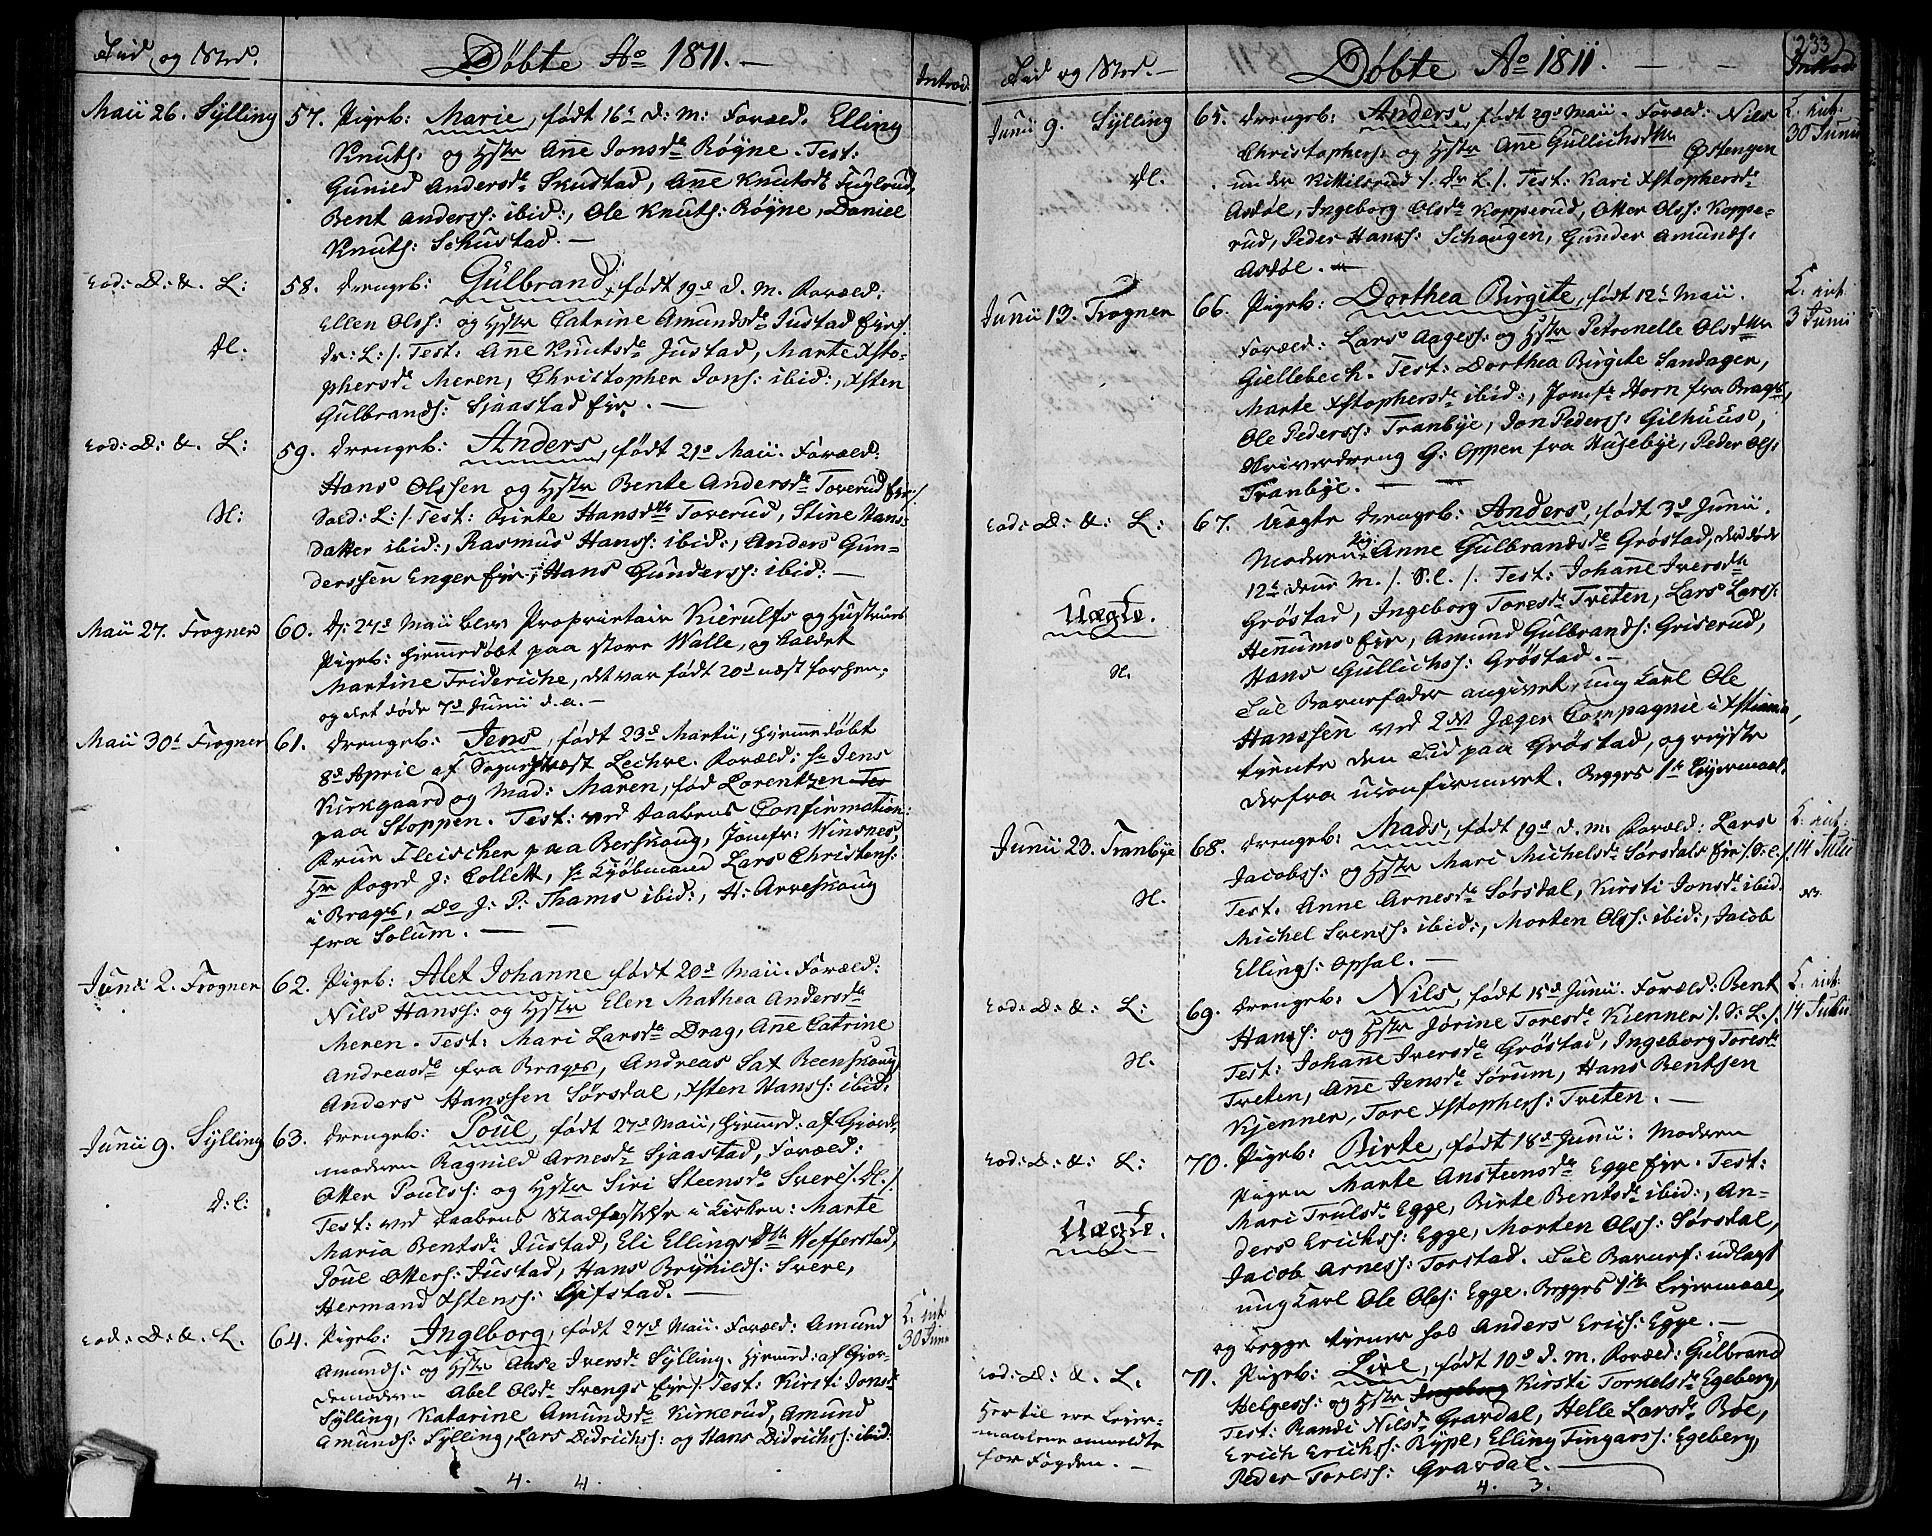 SAKO, Lier kirkebøker, F/Fa/L0007: Ministerialbok nr. I 7, 1794-1813, s. 233